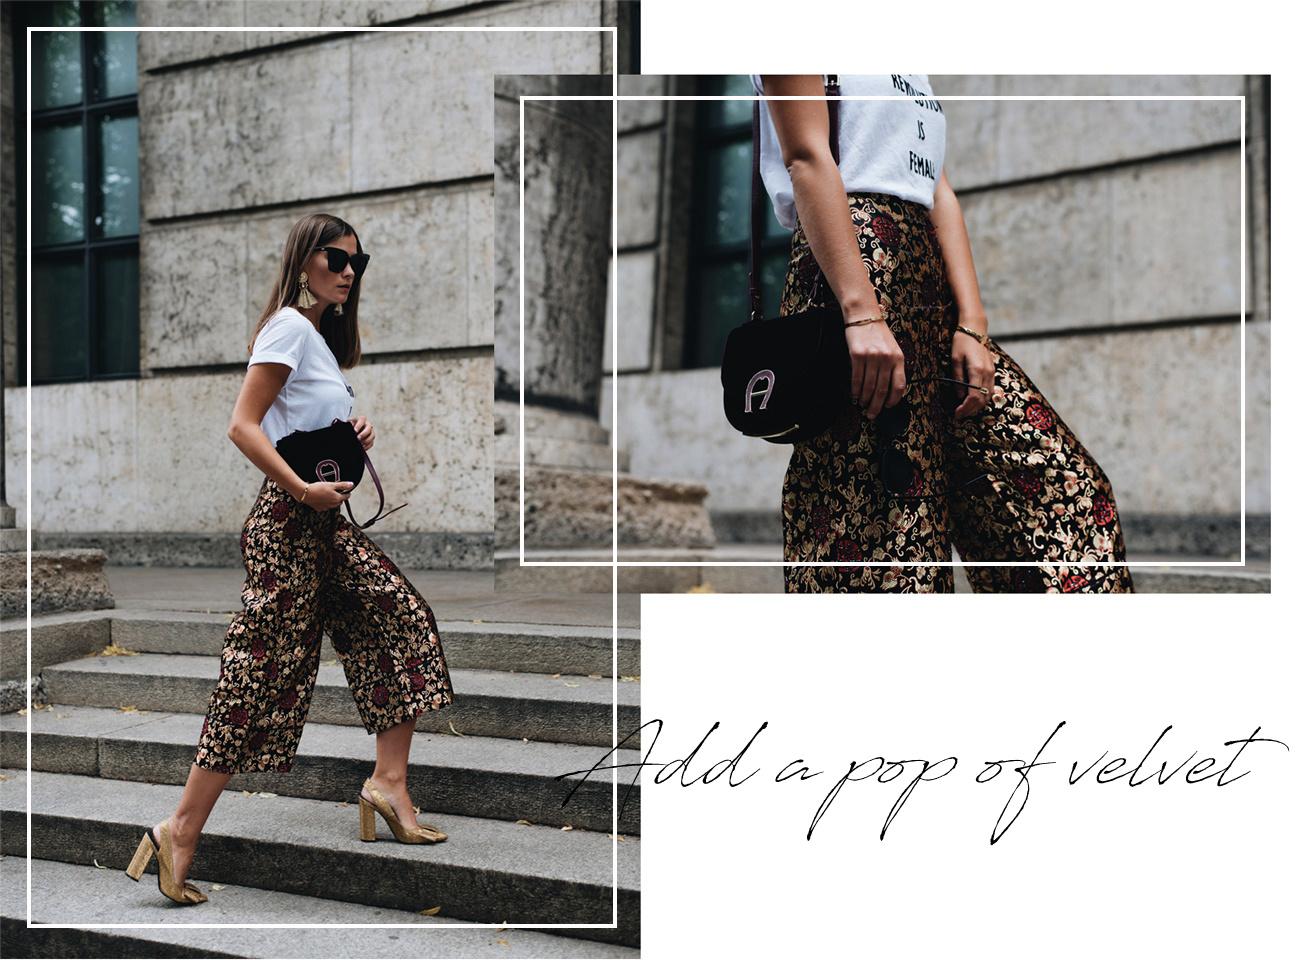 Collage-Aigner-Pina-Bag-Culotte-Statment-Shirt-Fashiioncarpet-nina-schwichtenberg_1